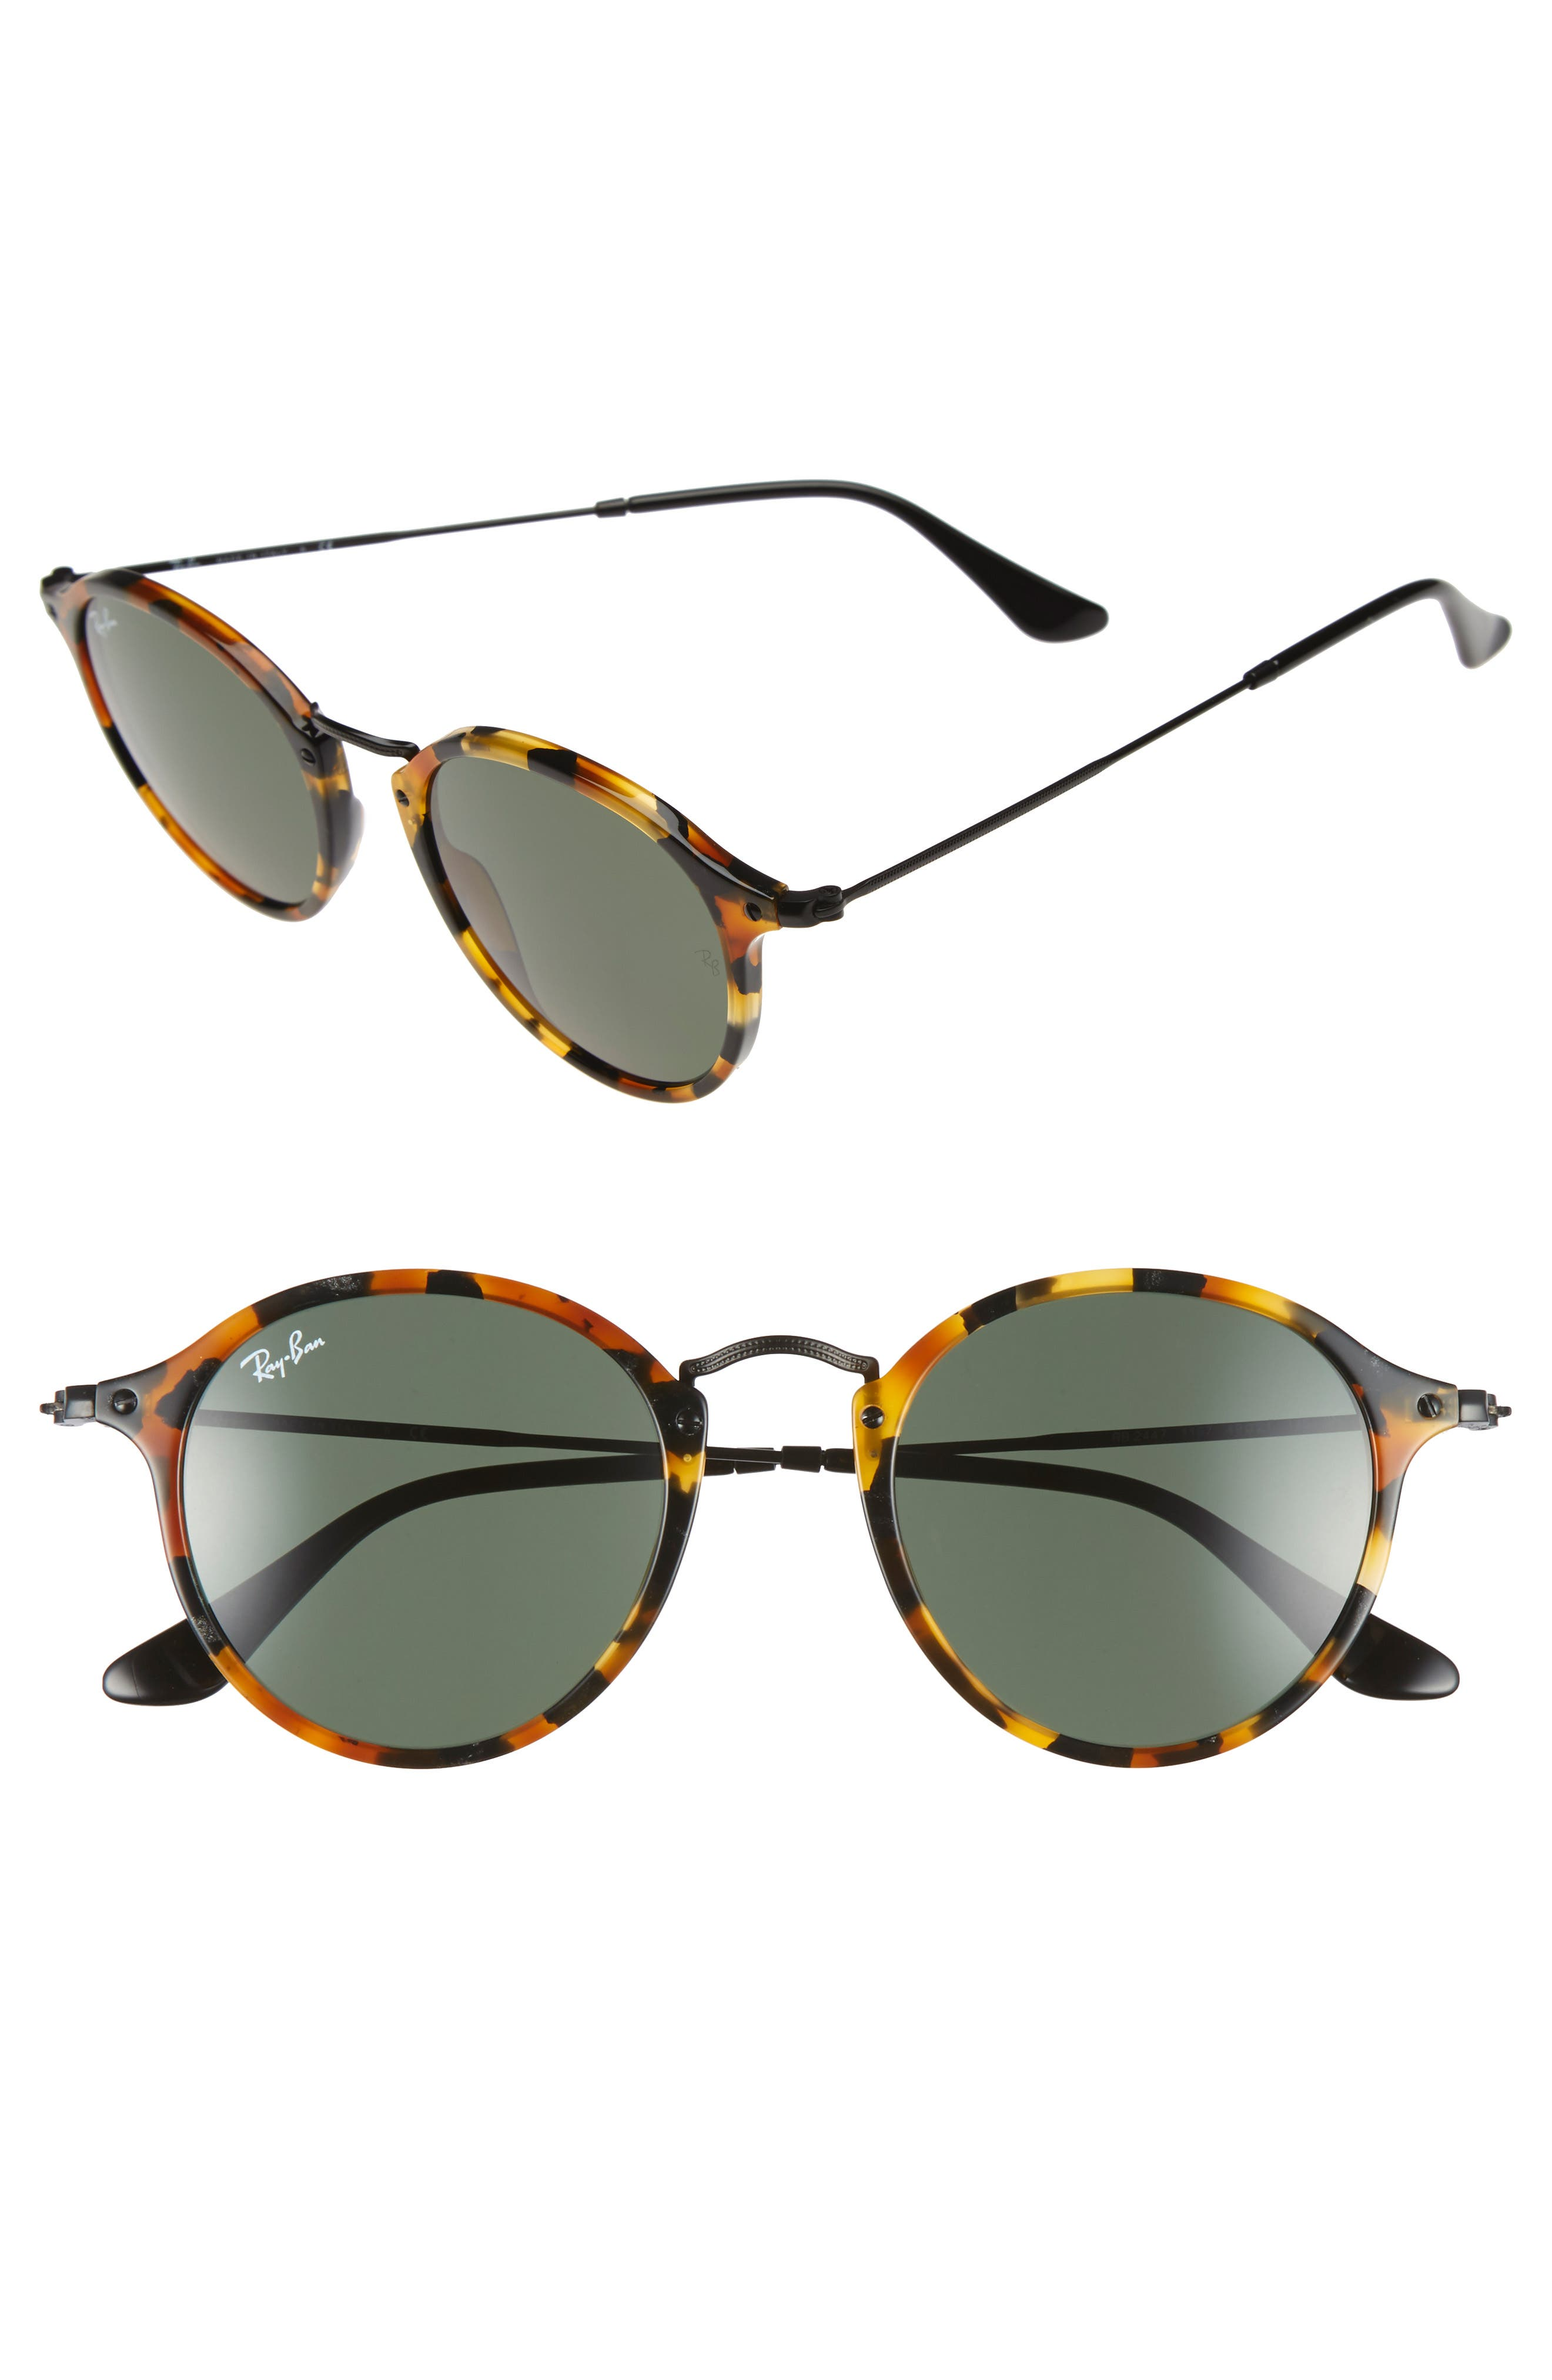 49mm Retro Sunglasses,                             Main thumbnail 1, color,                             SPOTTED BLACK HAVANA/ GREEN